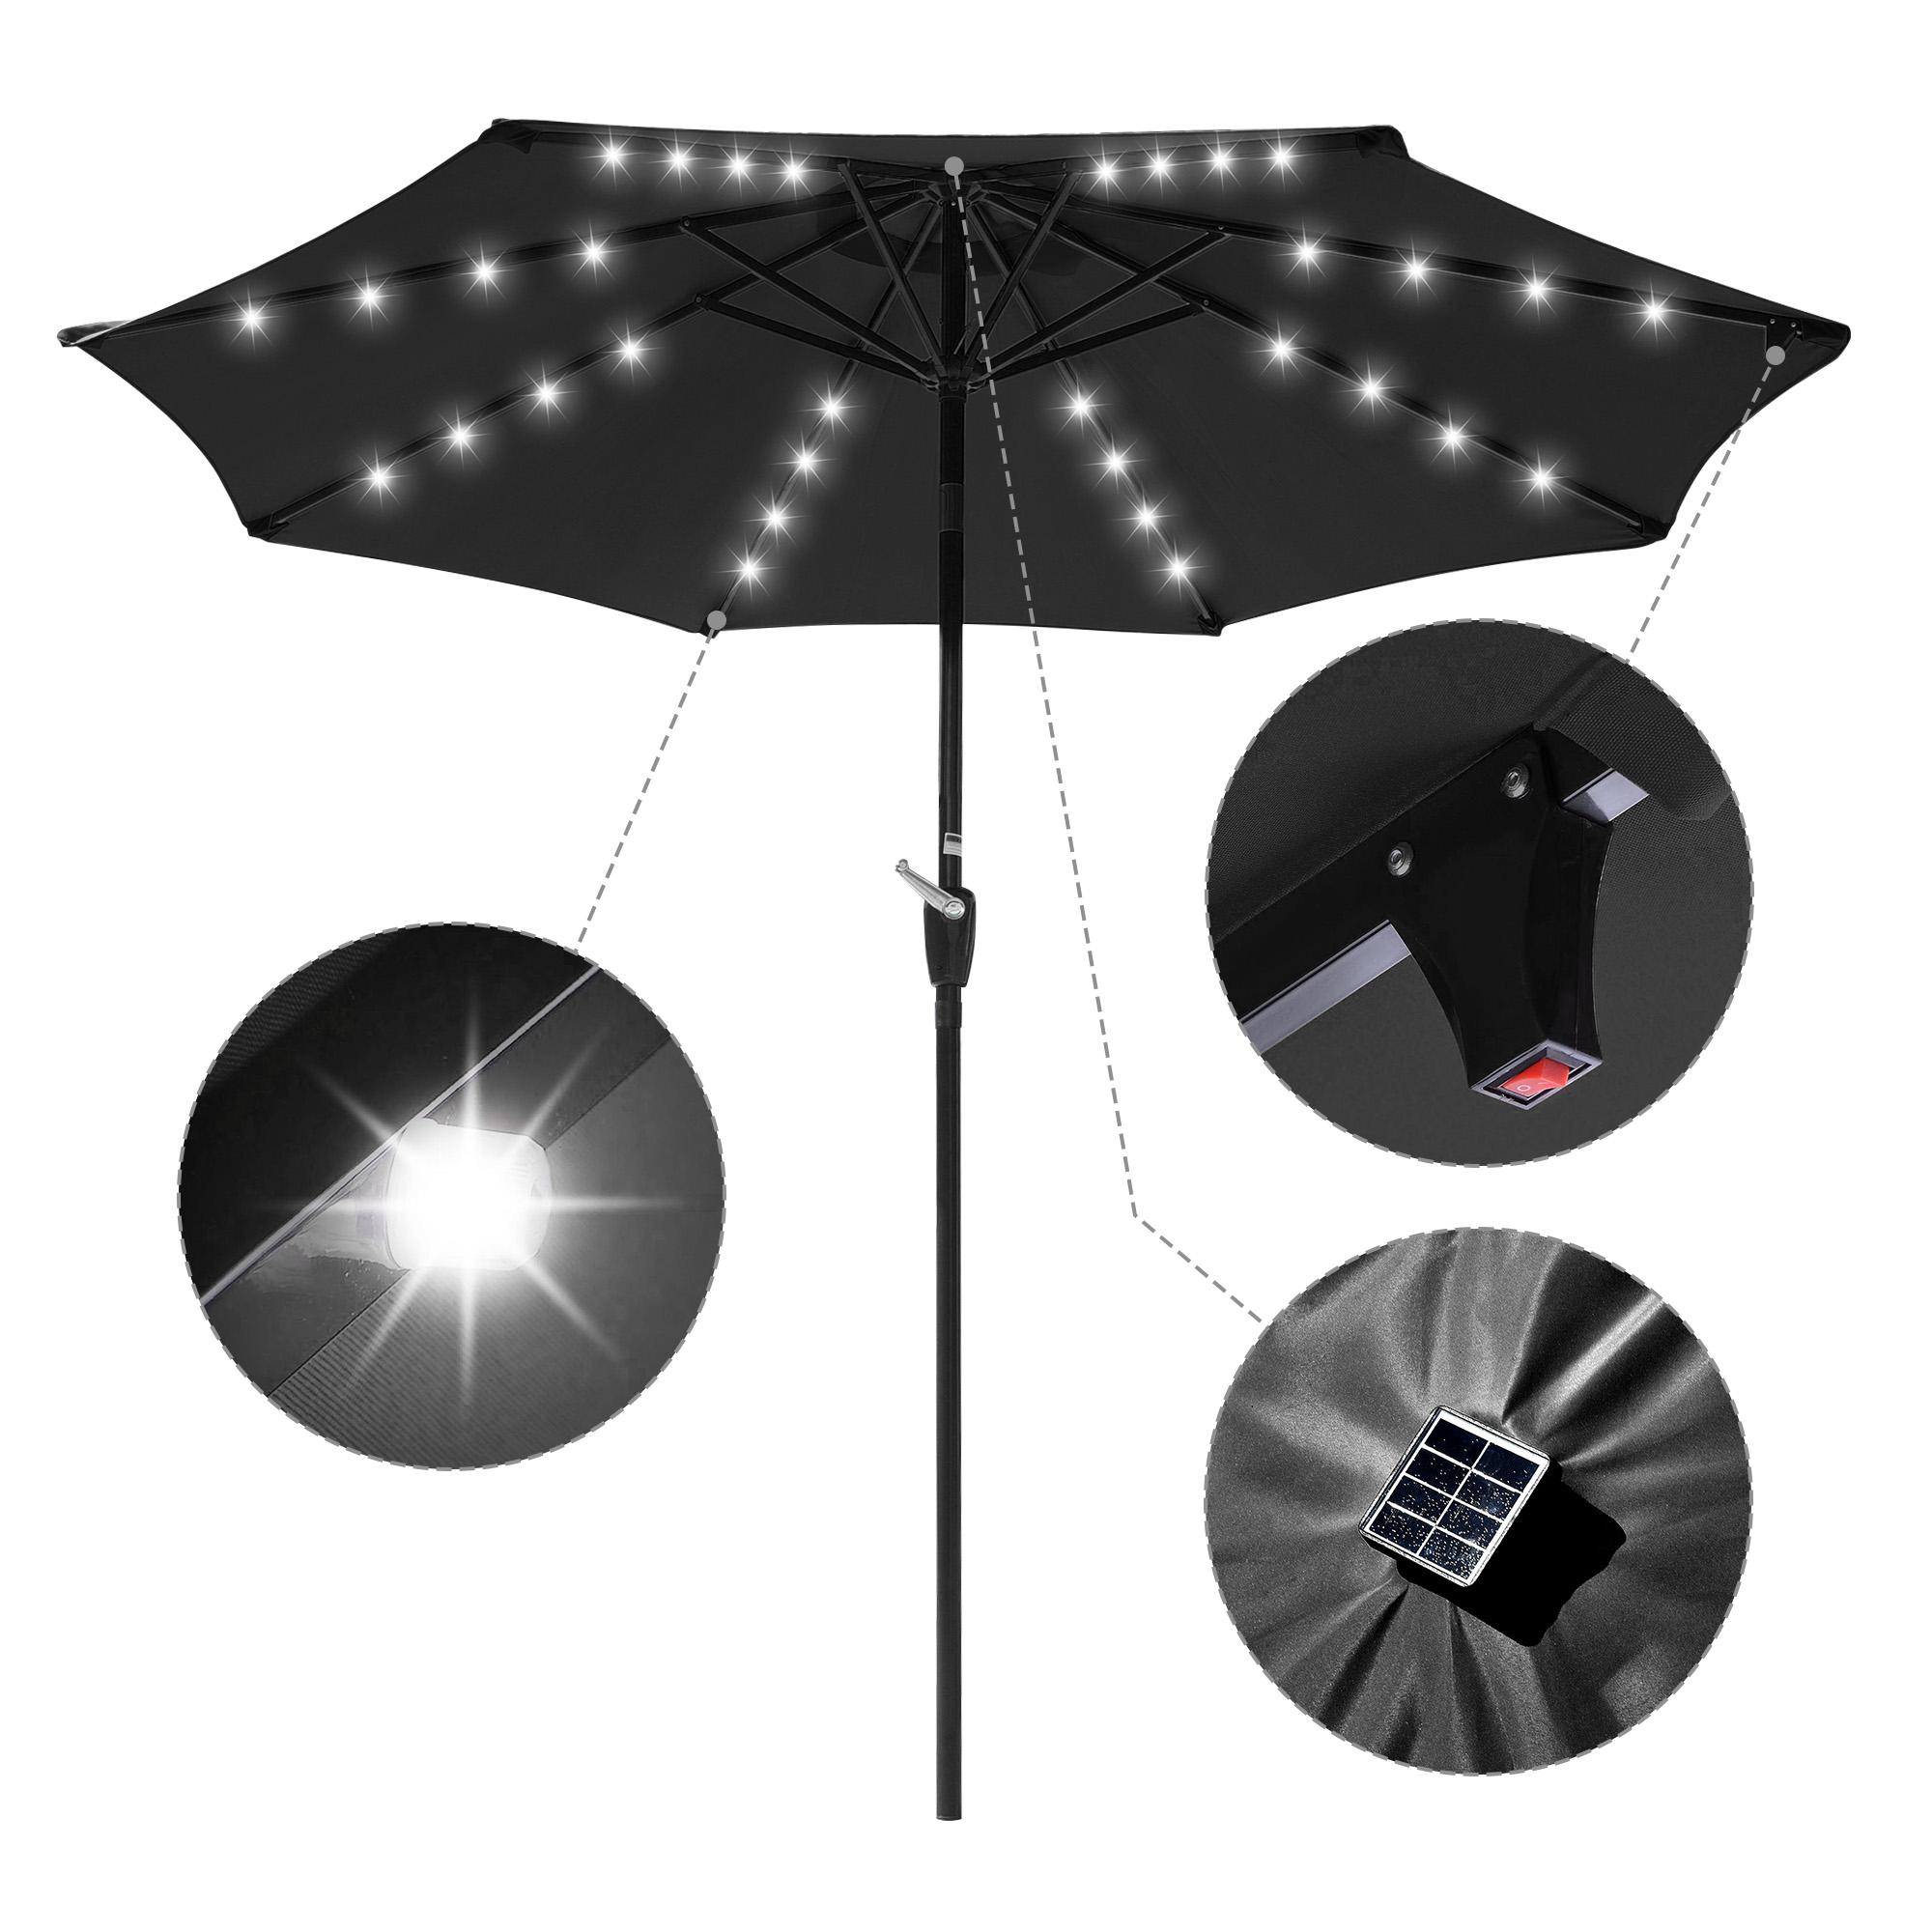 thumbnail 42 - 9' Patio Outdoor Umbrella Solar LED 8 Rib Garden Parasol Yard Deck Table Shade